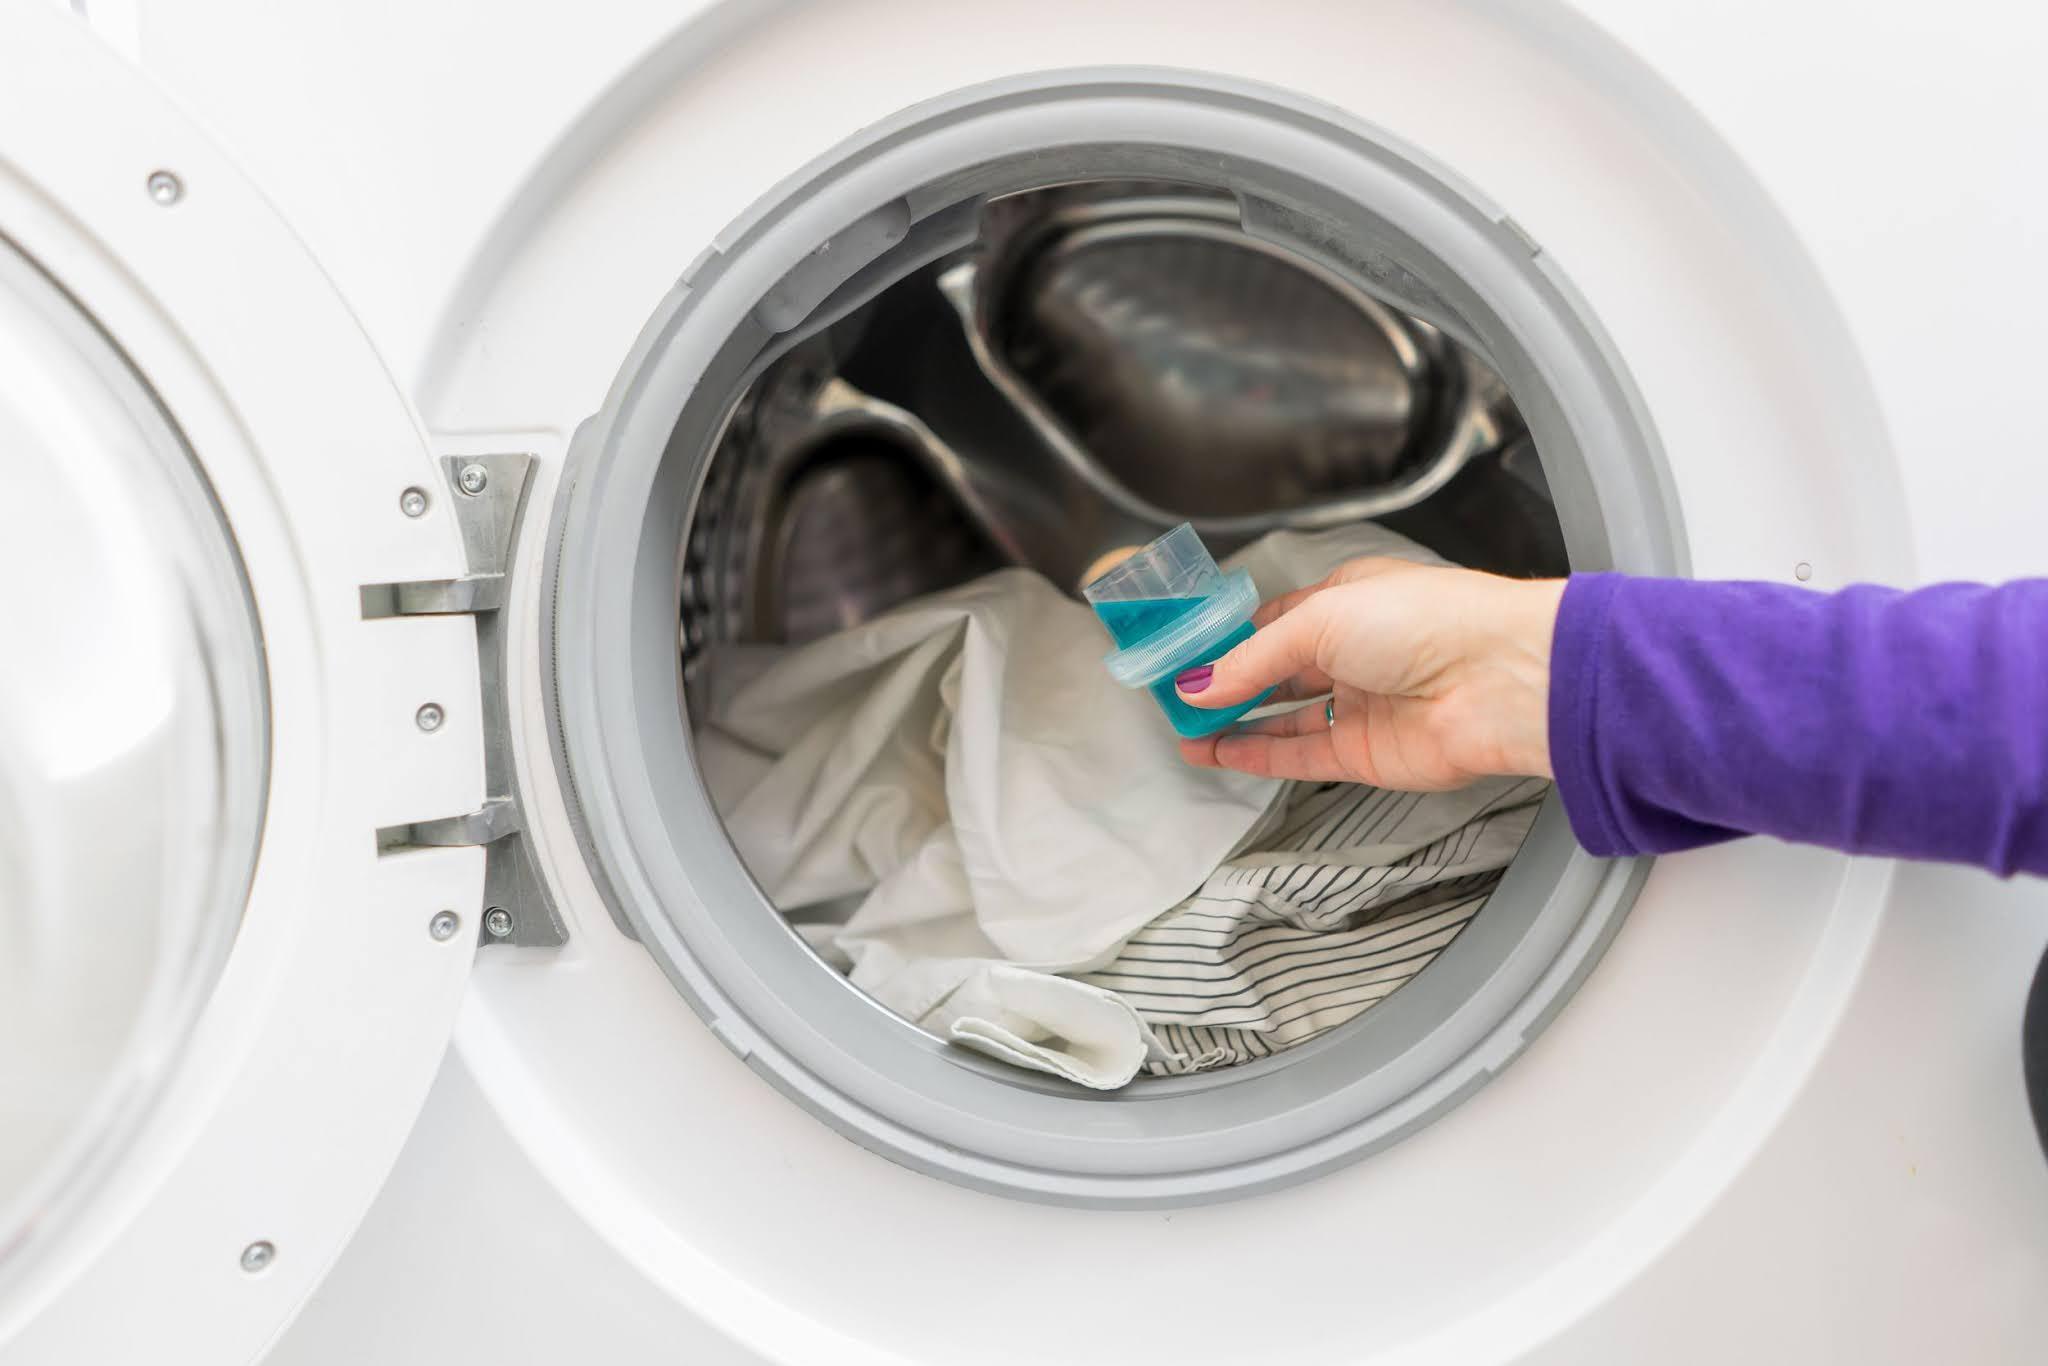 Pewangi Pakaian Hemat ala Laundry